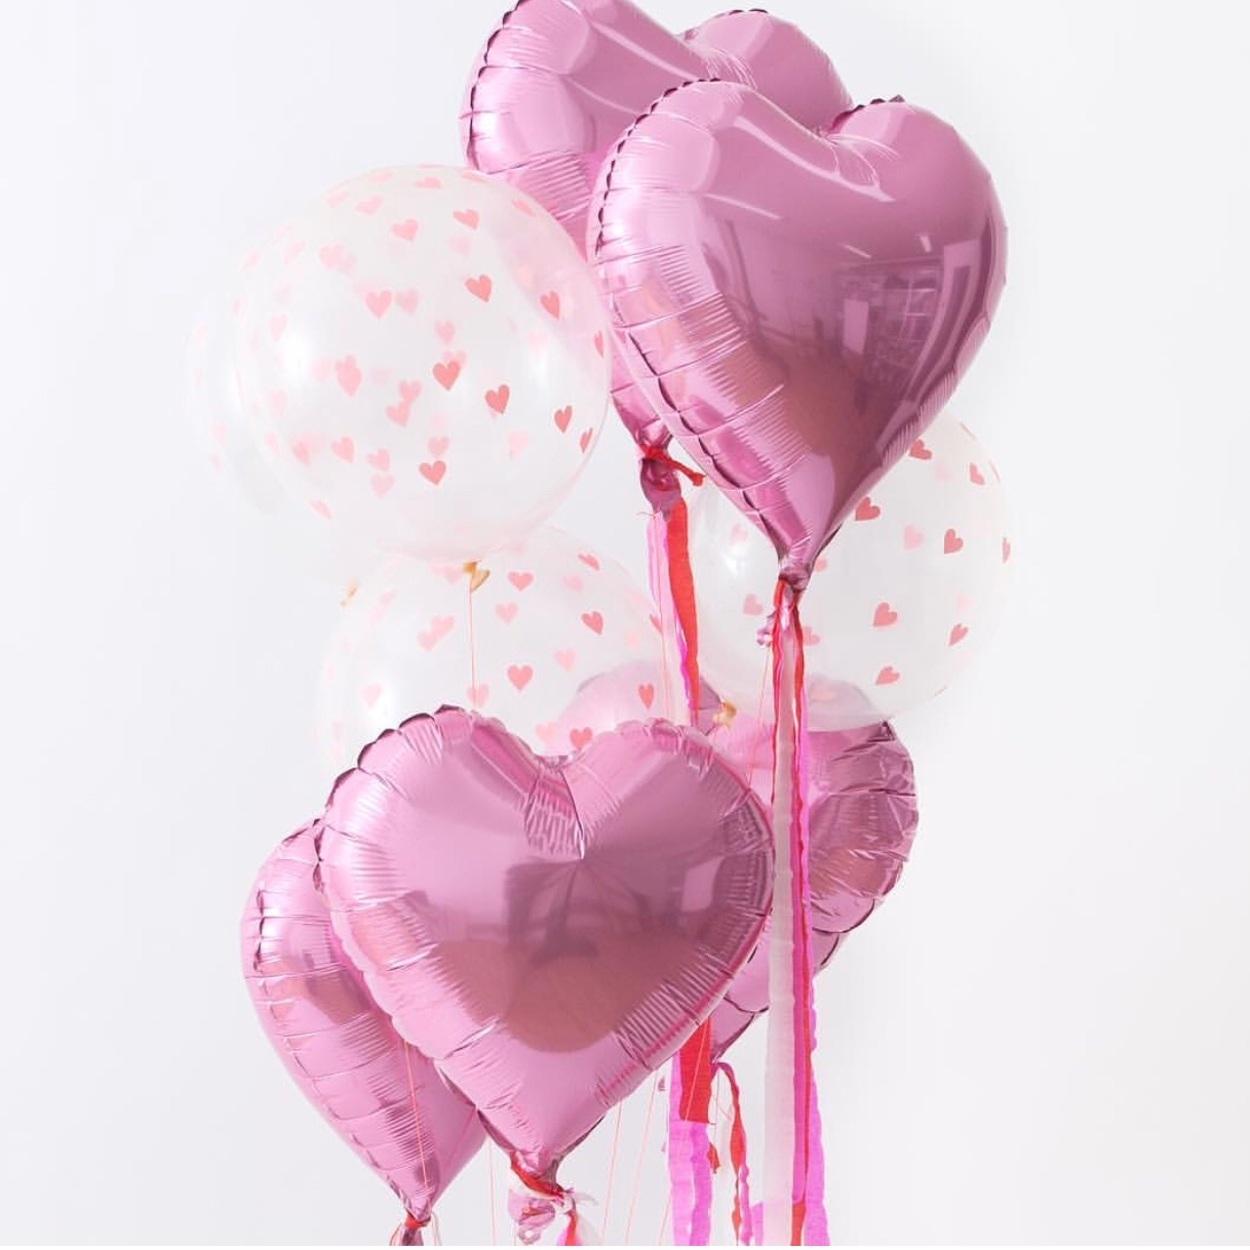 Heart Shaped Balloons From Kit